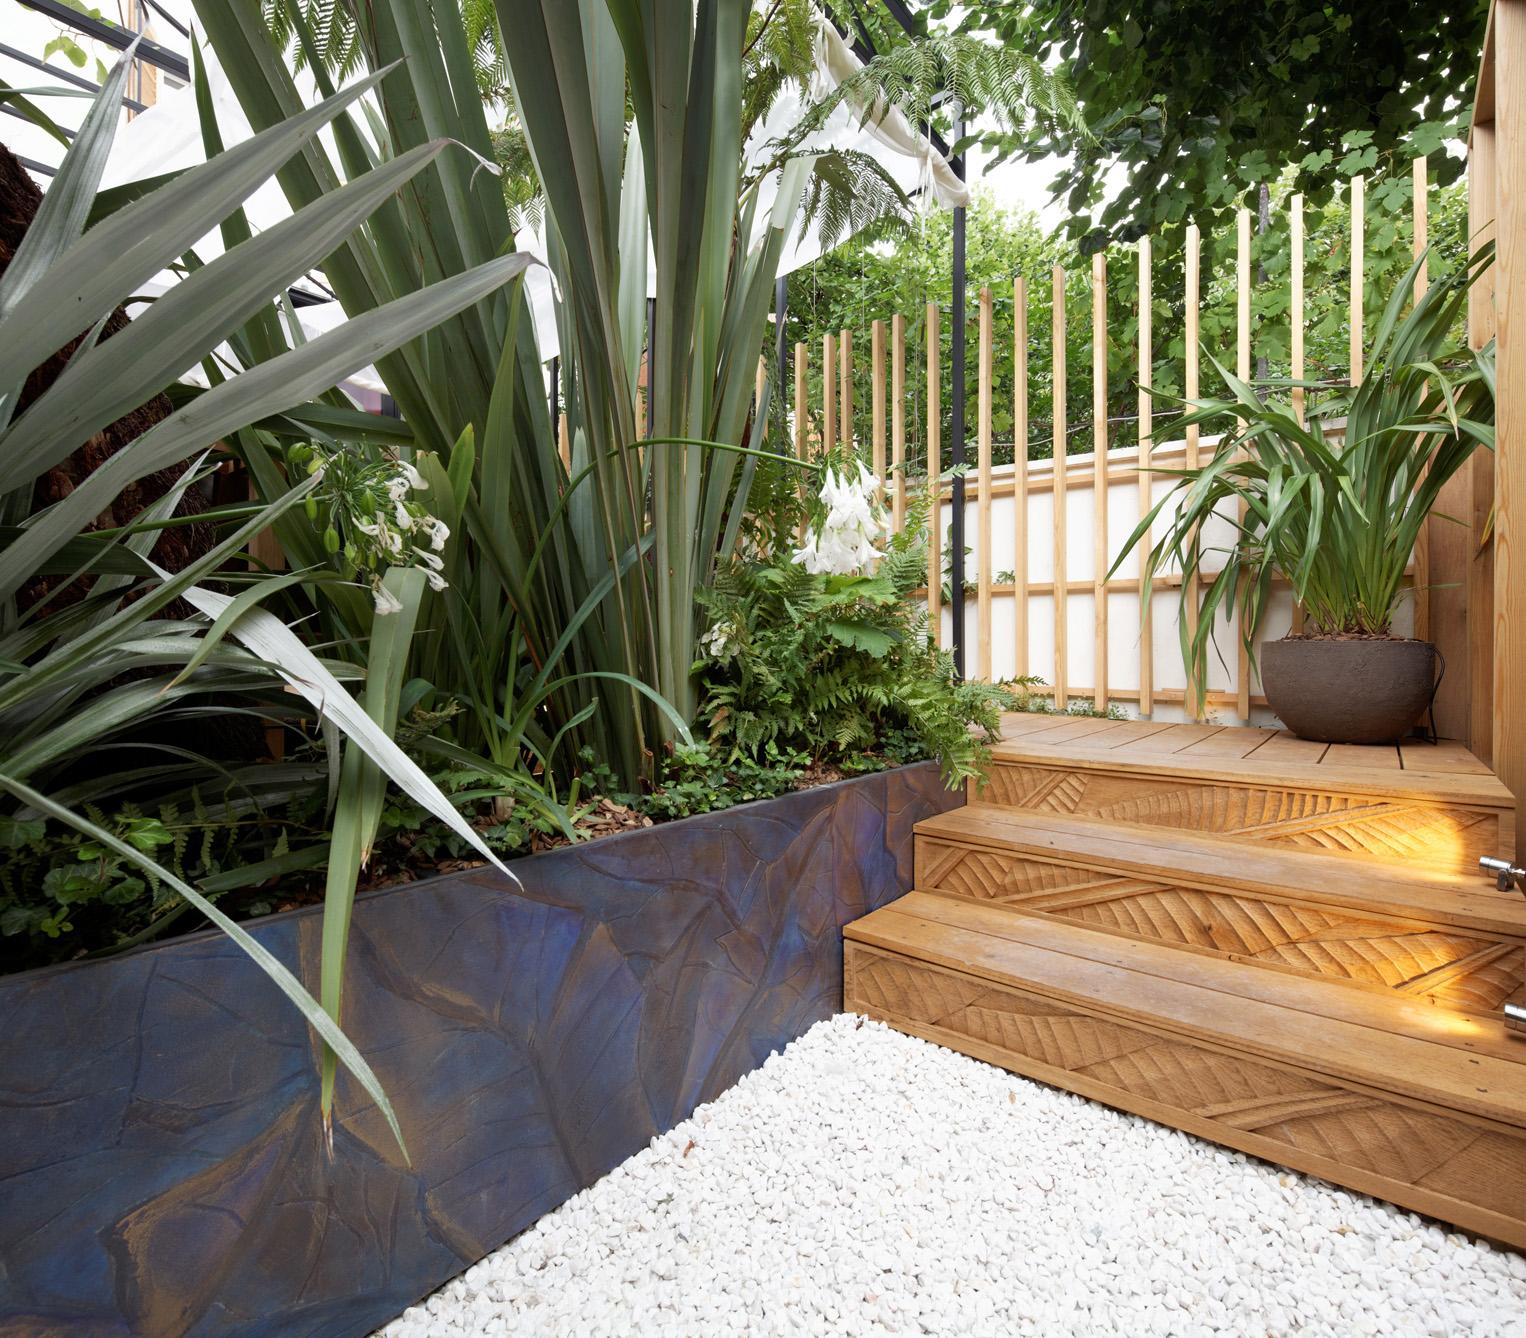 jardin_du_moulin_vert_paris_terrasses_jardins_outdoor_garden_christophe_gautrand_paysagiste_2.jpg